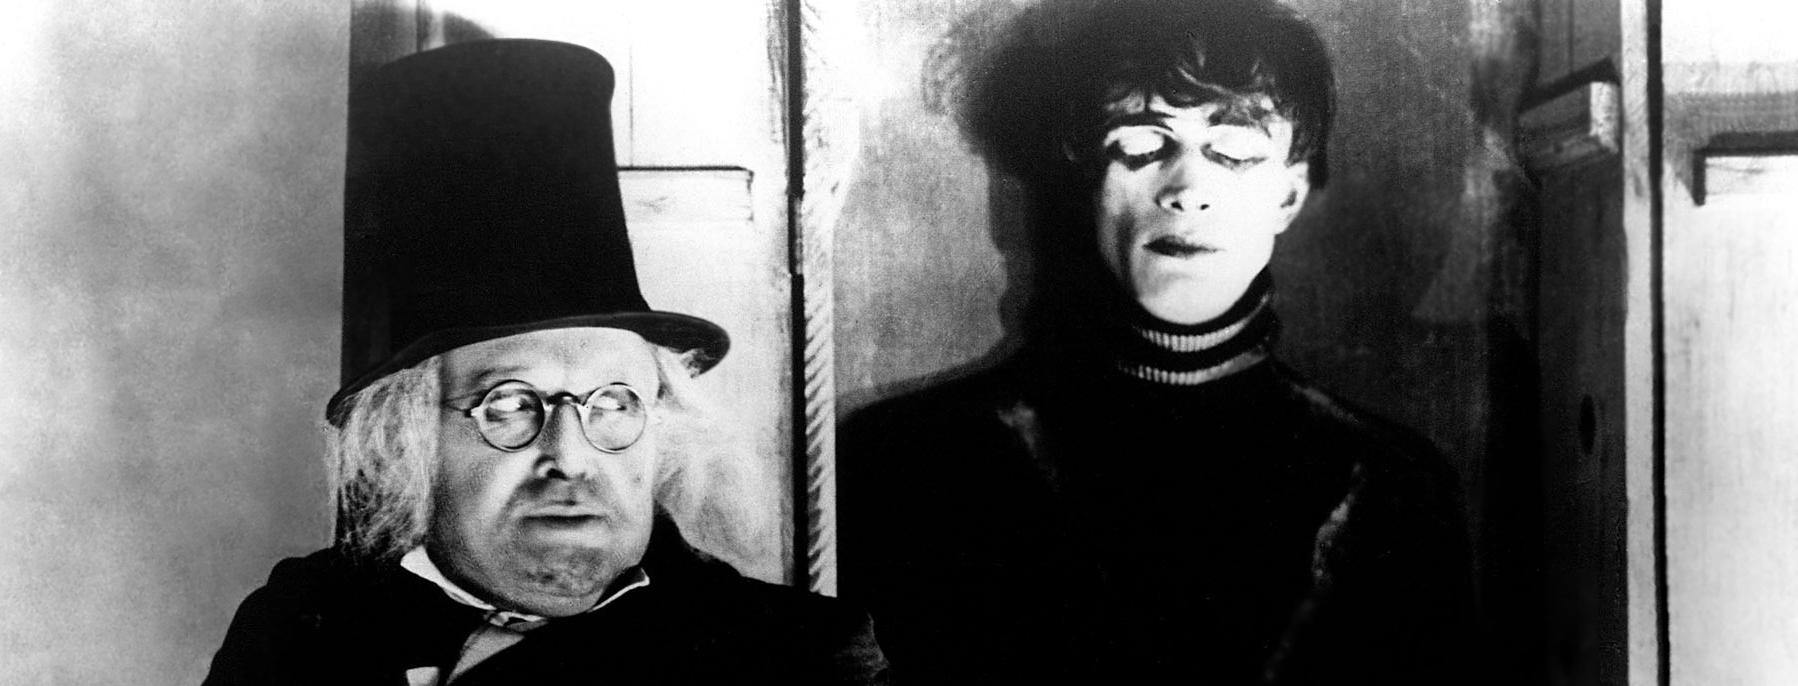 Caligari cine mudo